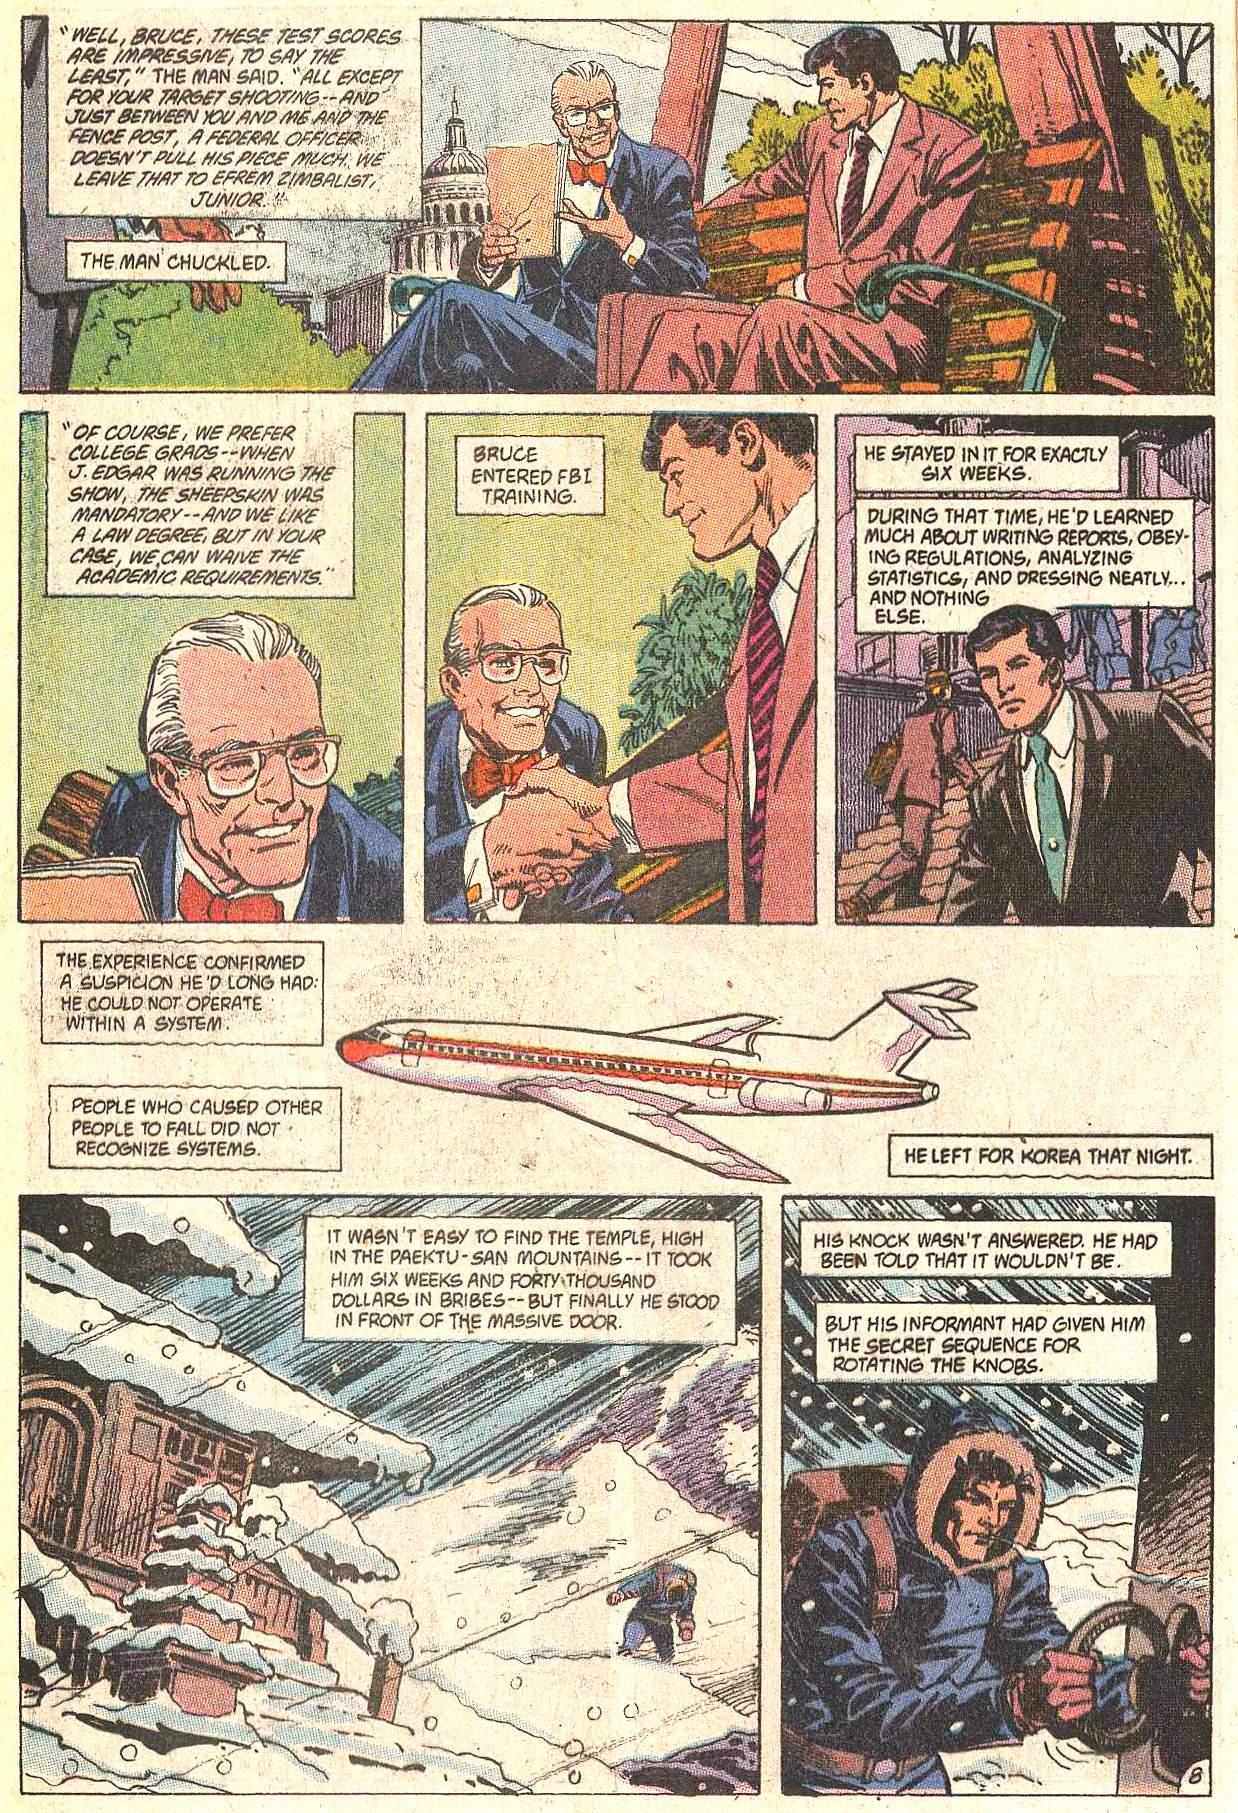 Psychology of Bruce Wayne RCO015